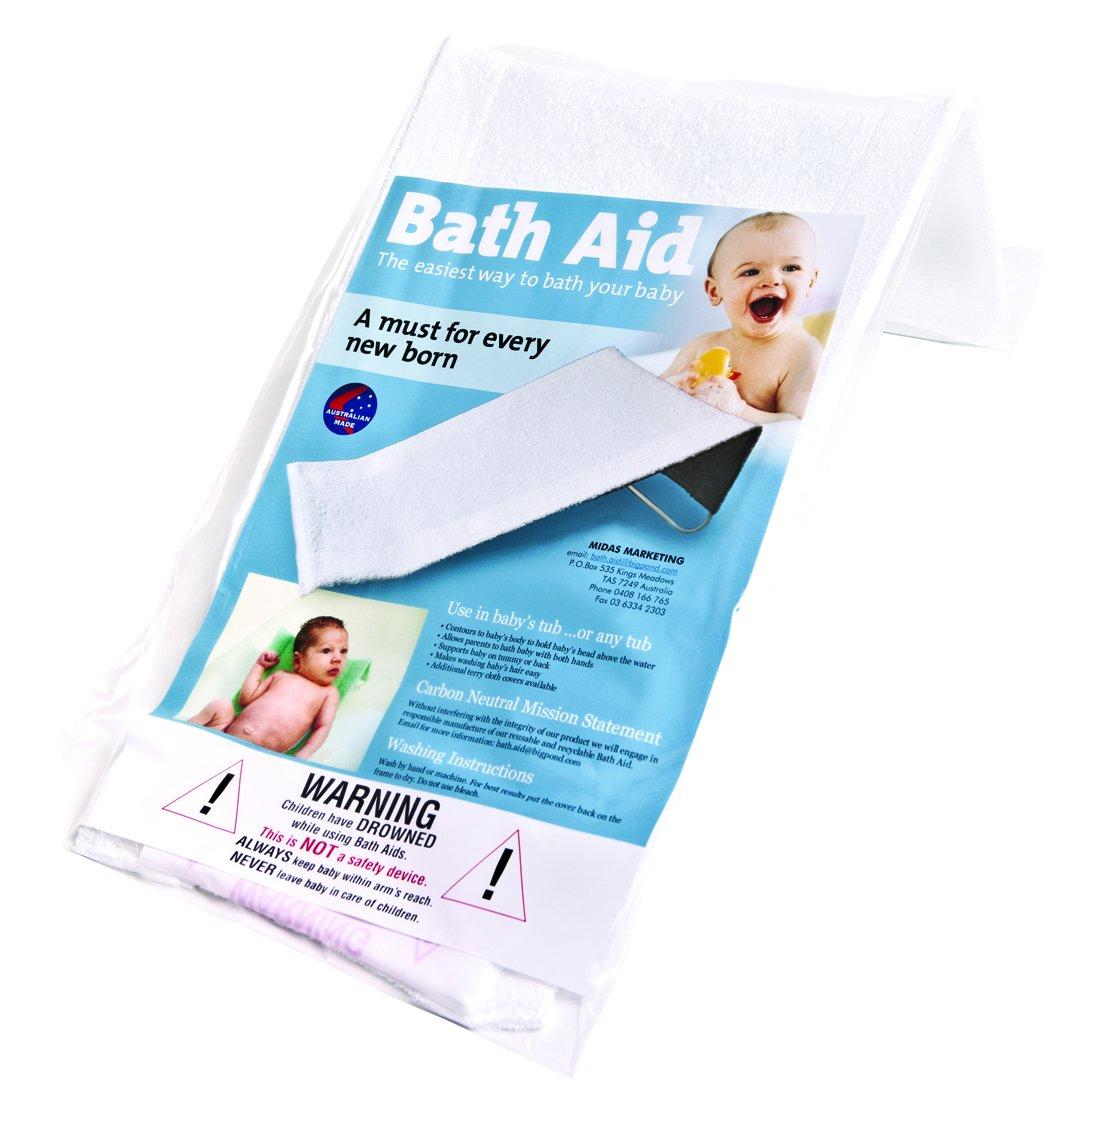 Babyrest Baby Bath Aid - White: Amazon.com.au: Baby